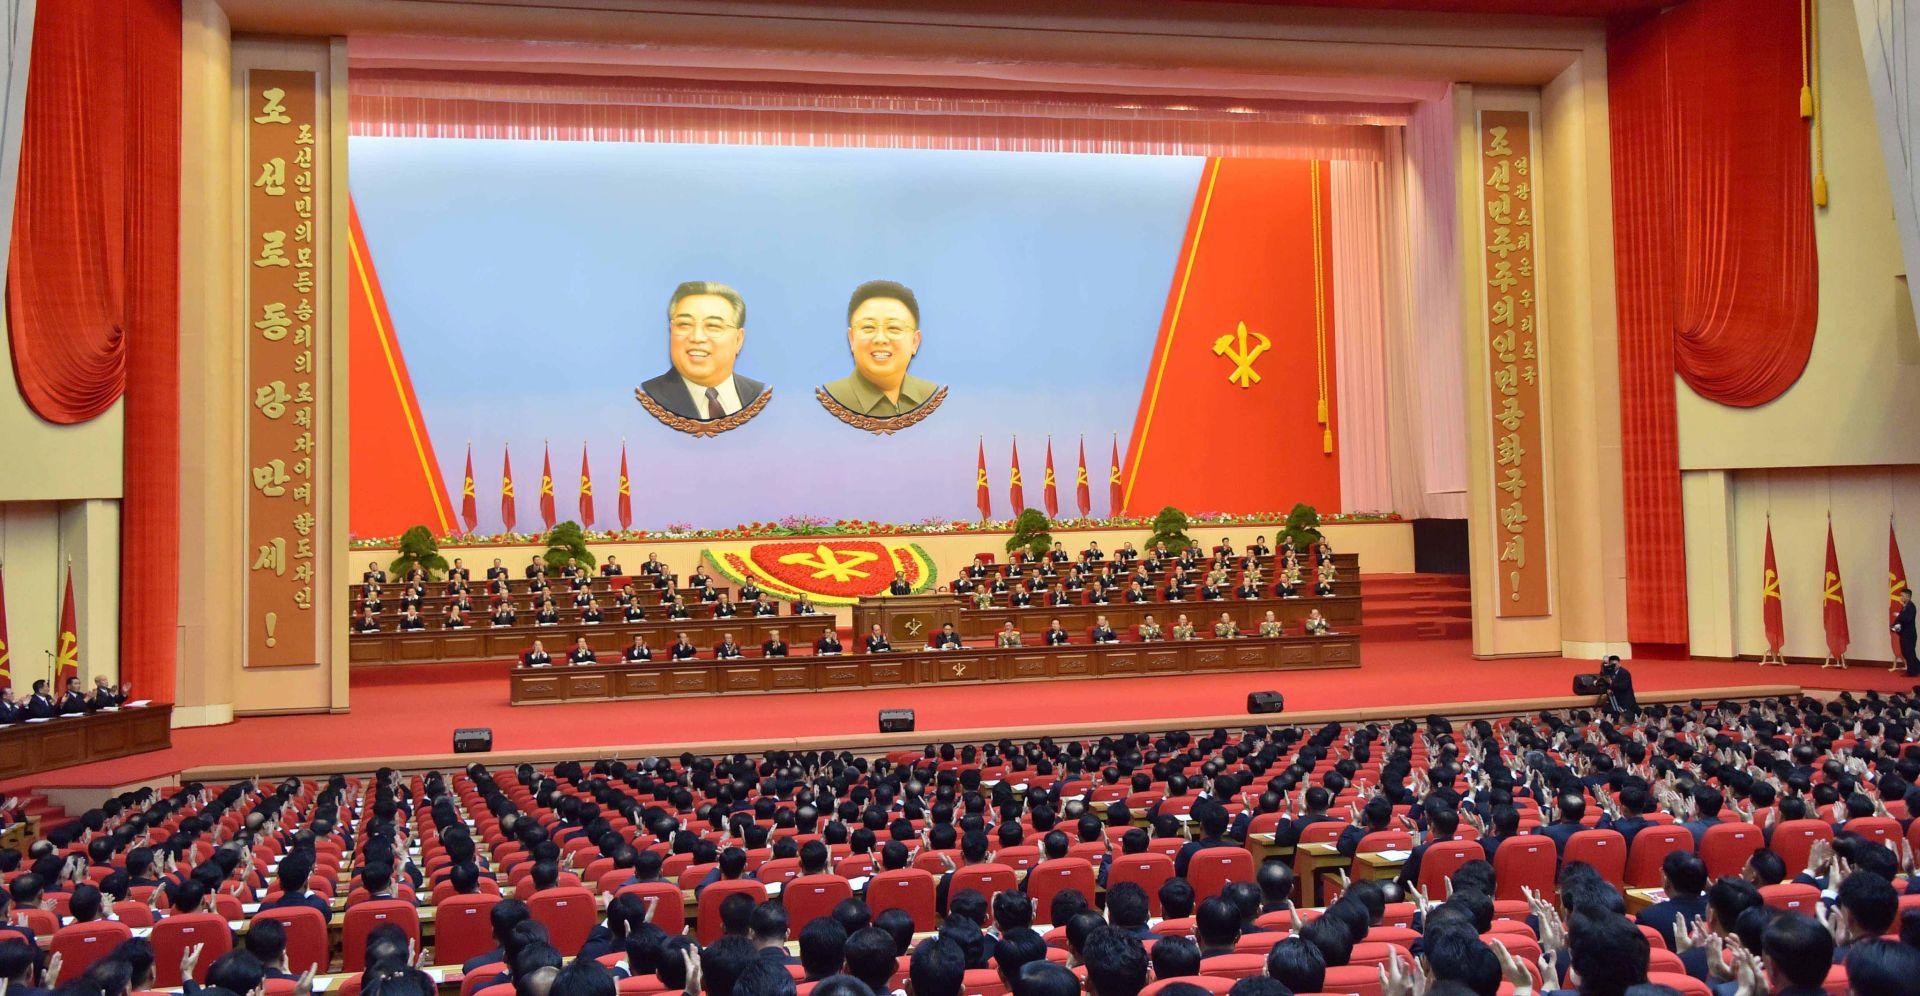 ODLUKA KONGRESA: Sjeverna Koreja najavila daljnje jačanje nuklearnih kapaciteta